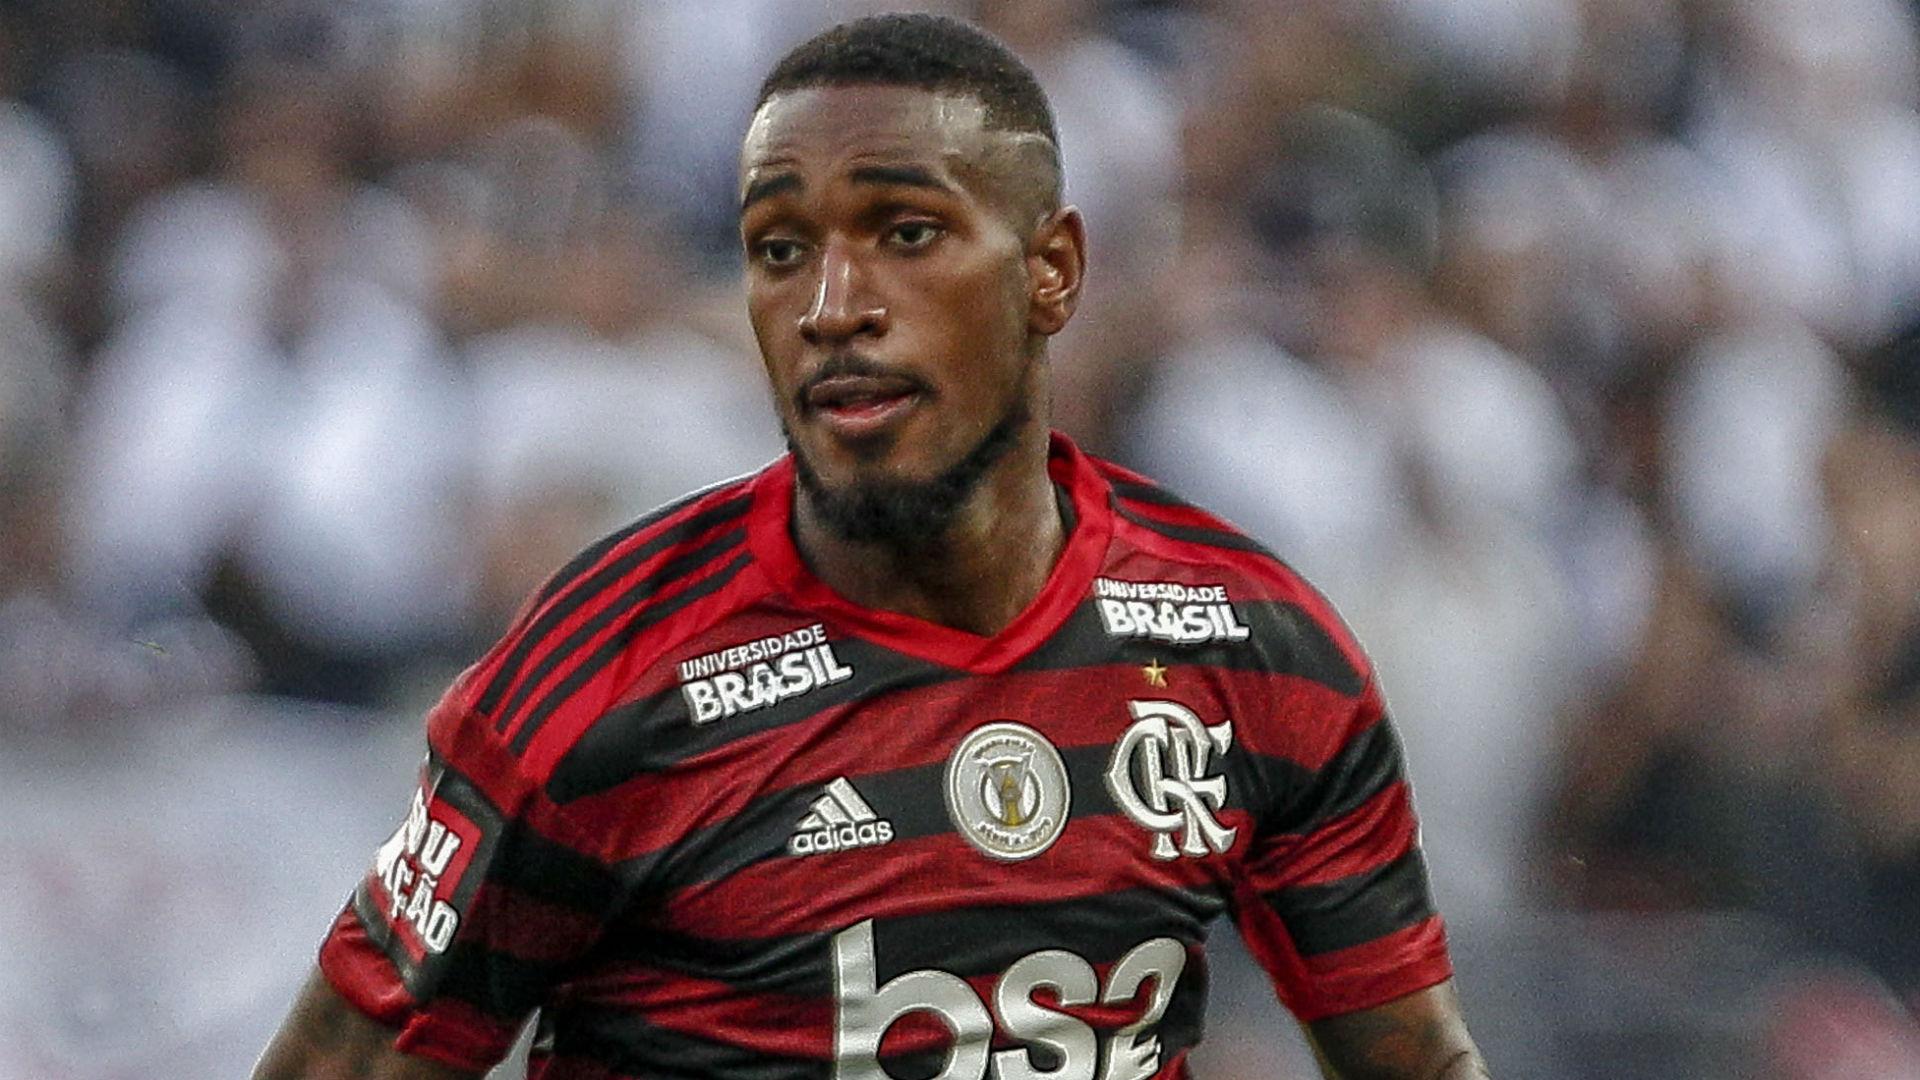 Arsenal, Tottenham & Borussia Dortmund interest in Gerson confirmed by Flamengo star's father